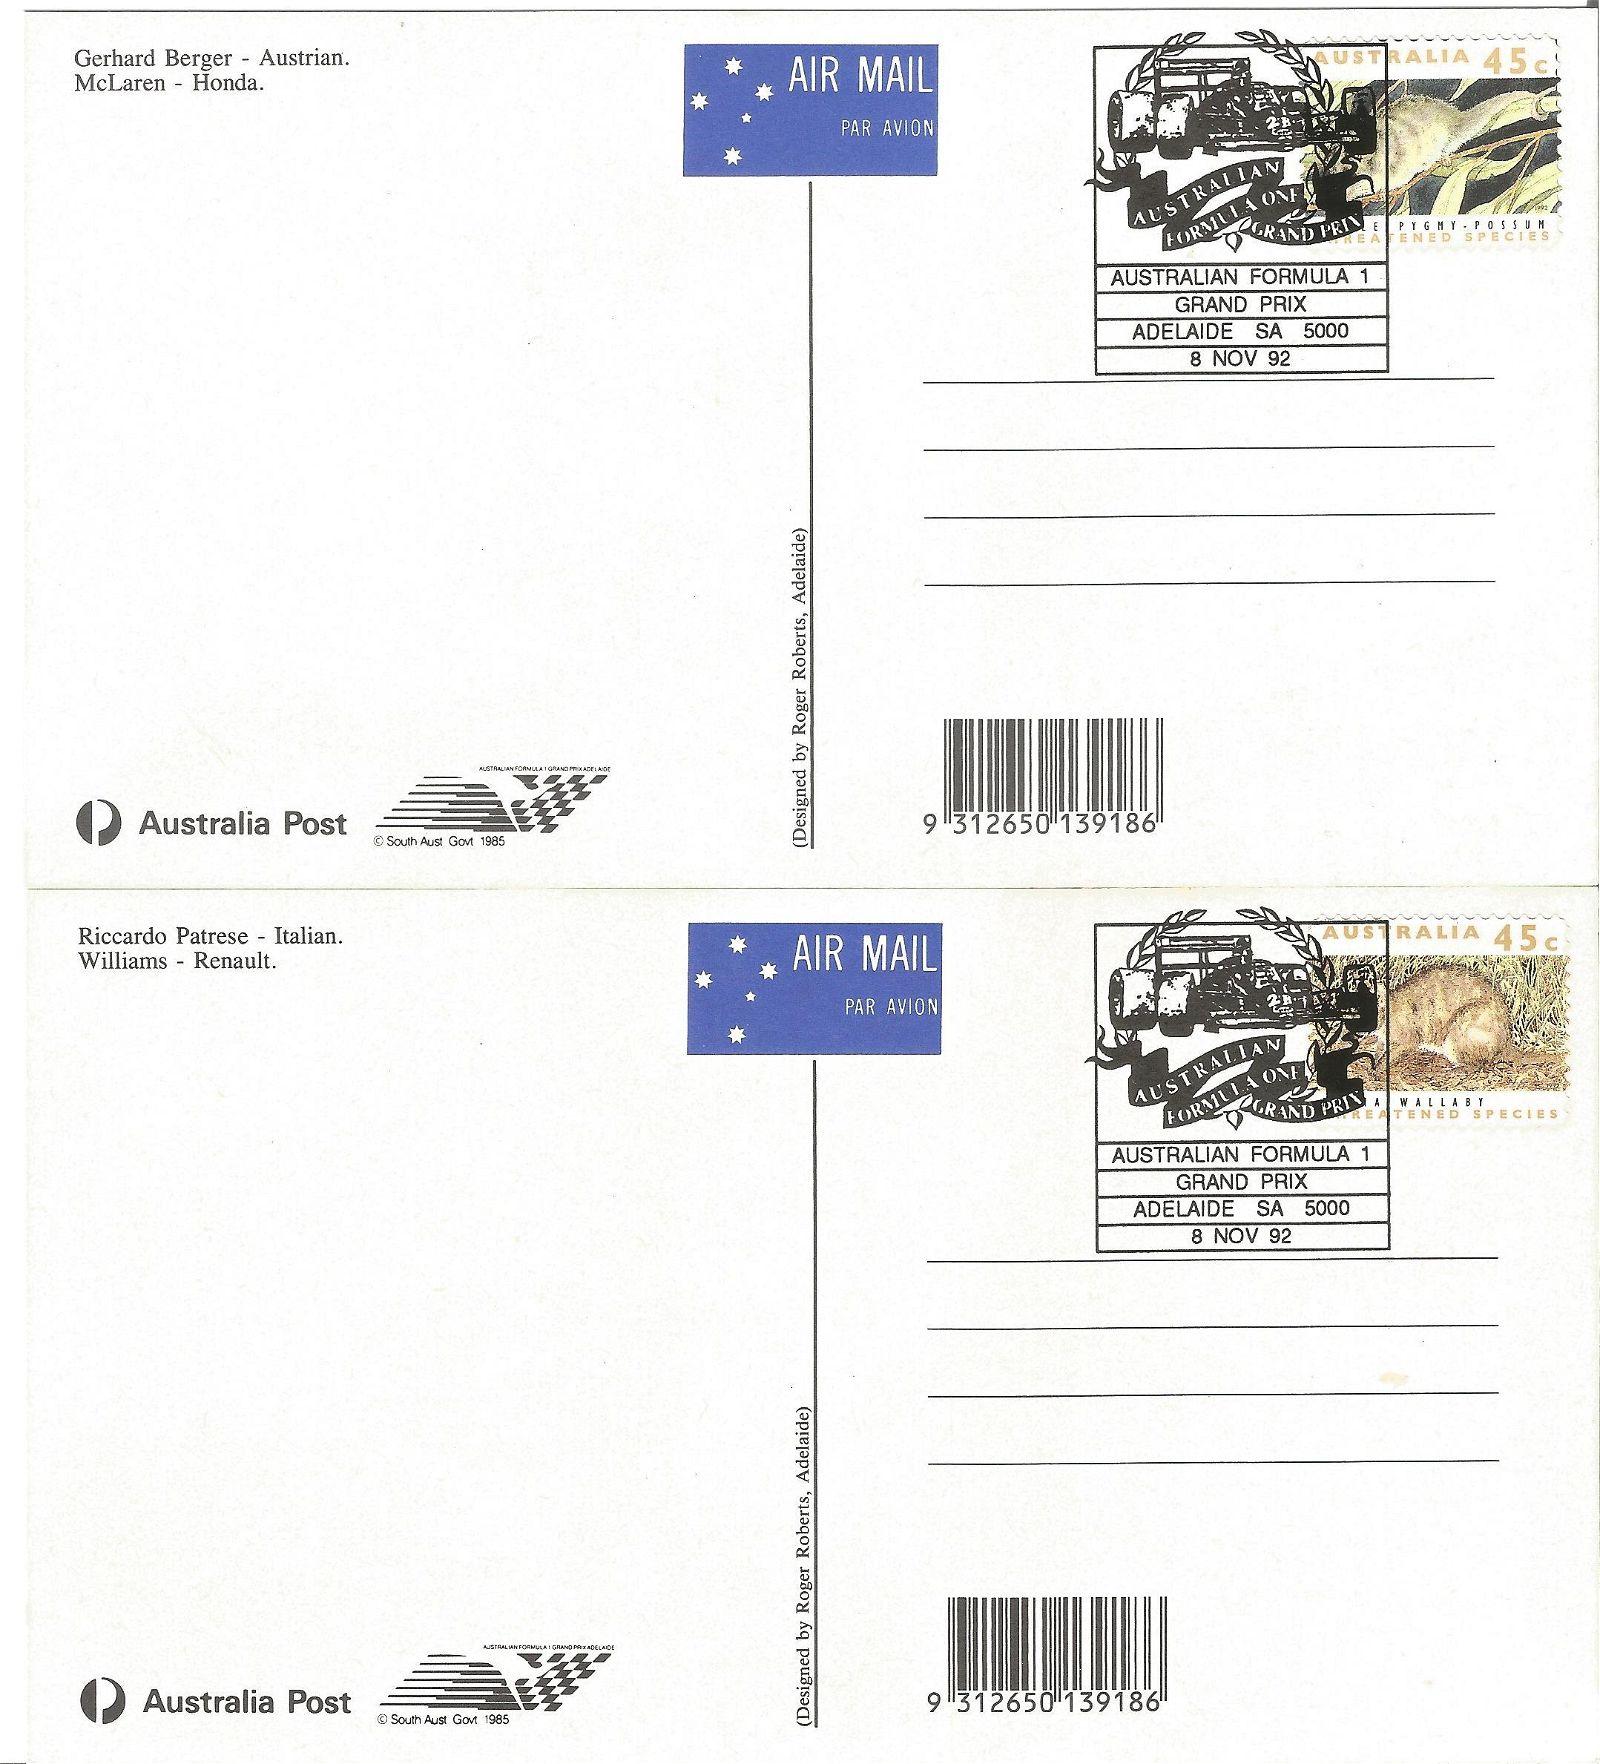 4 x Australian Formula 1 Grand Prix Air Mail Postcards